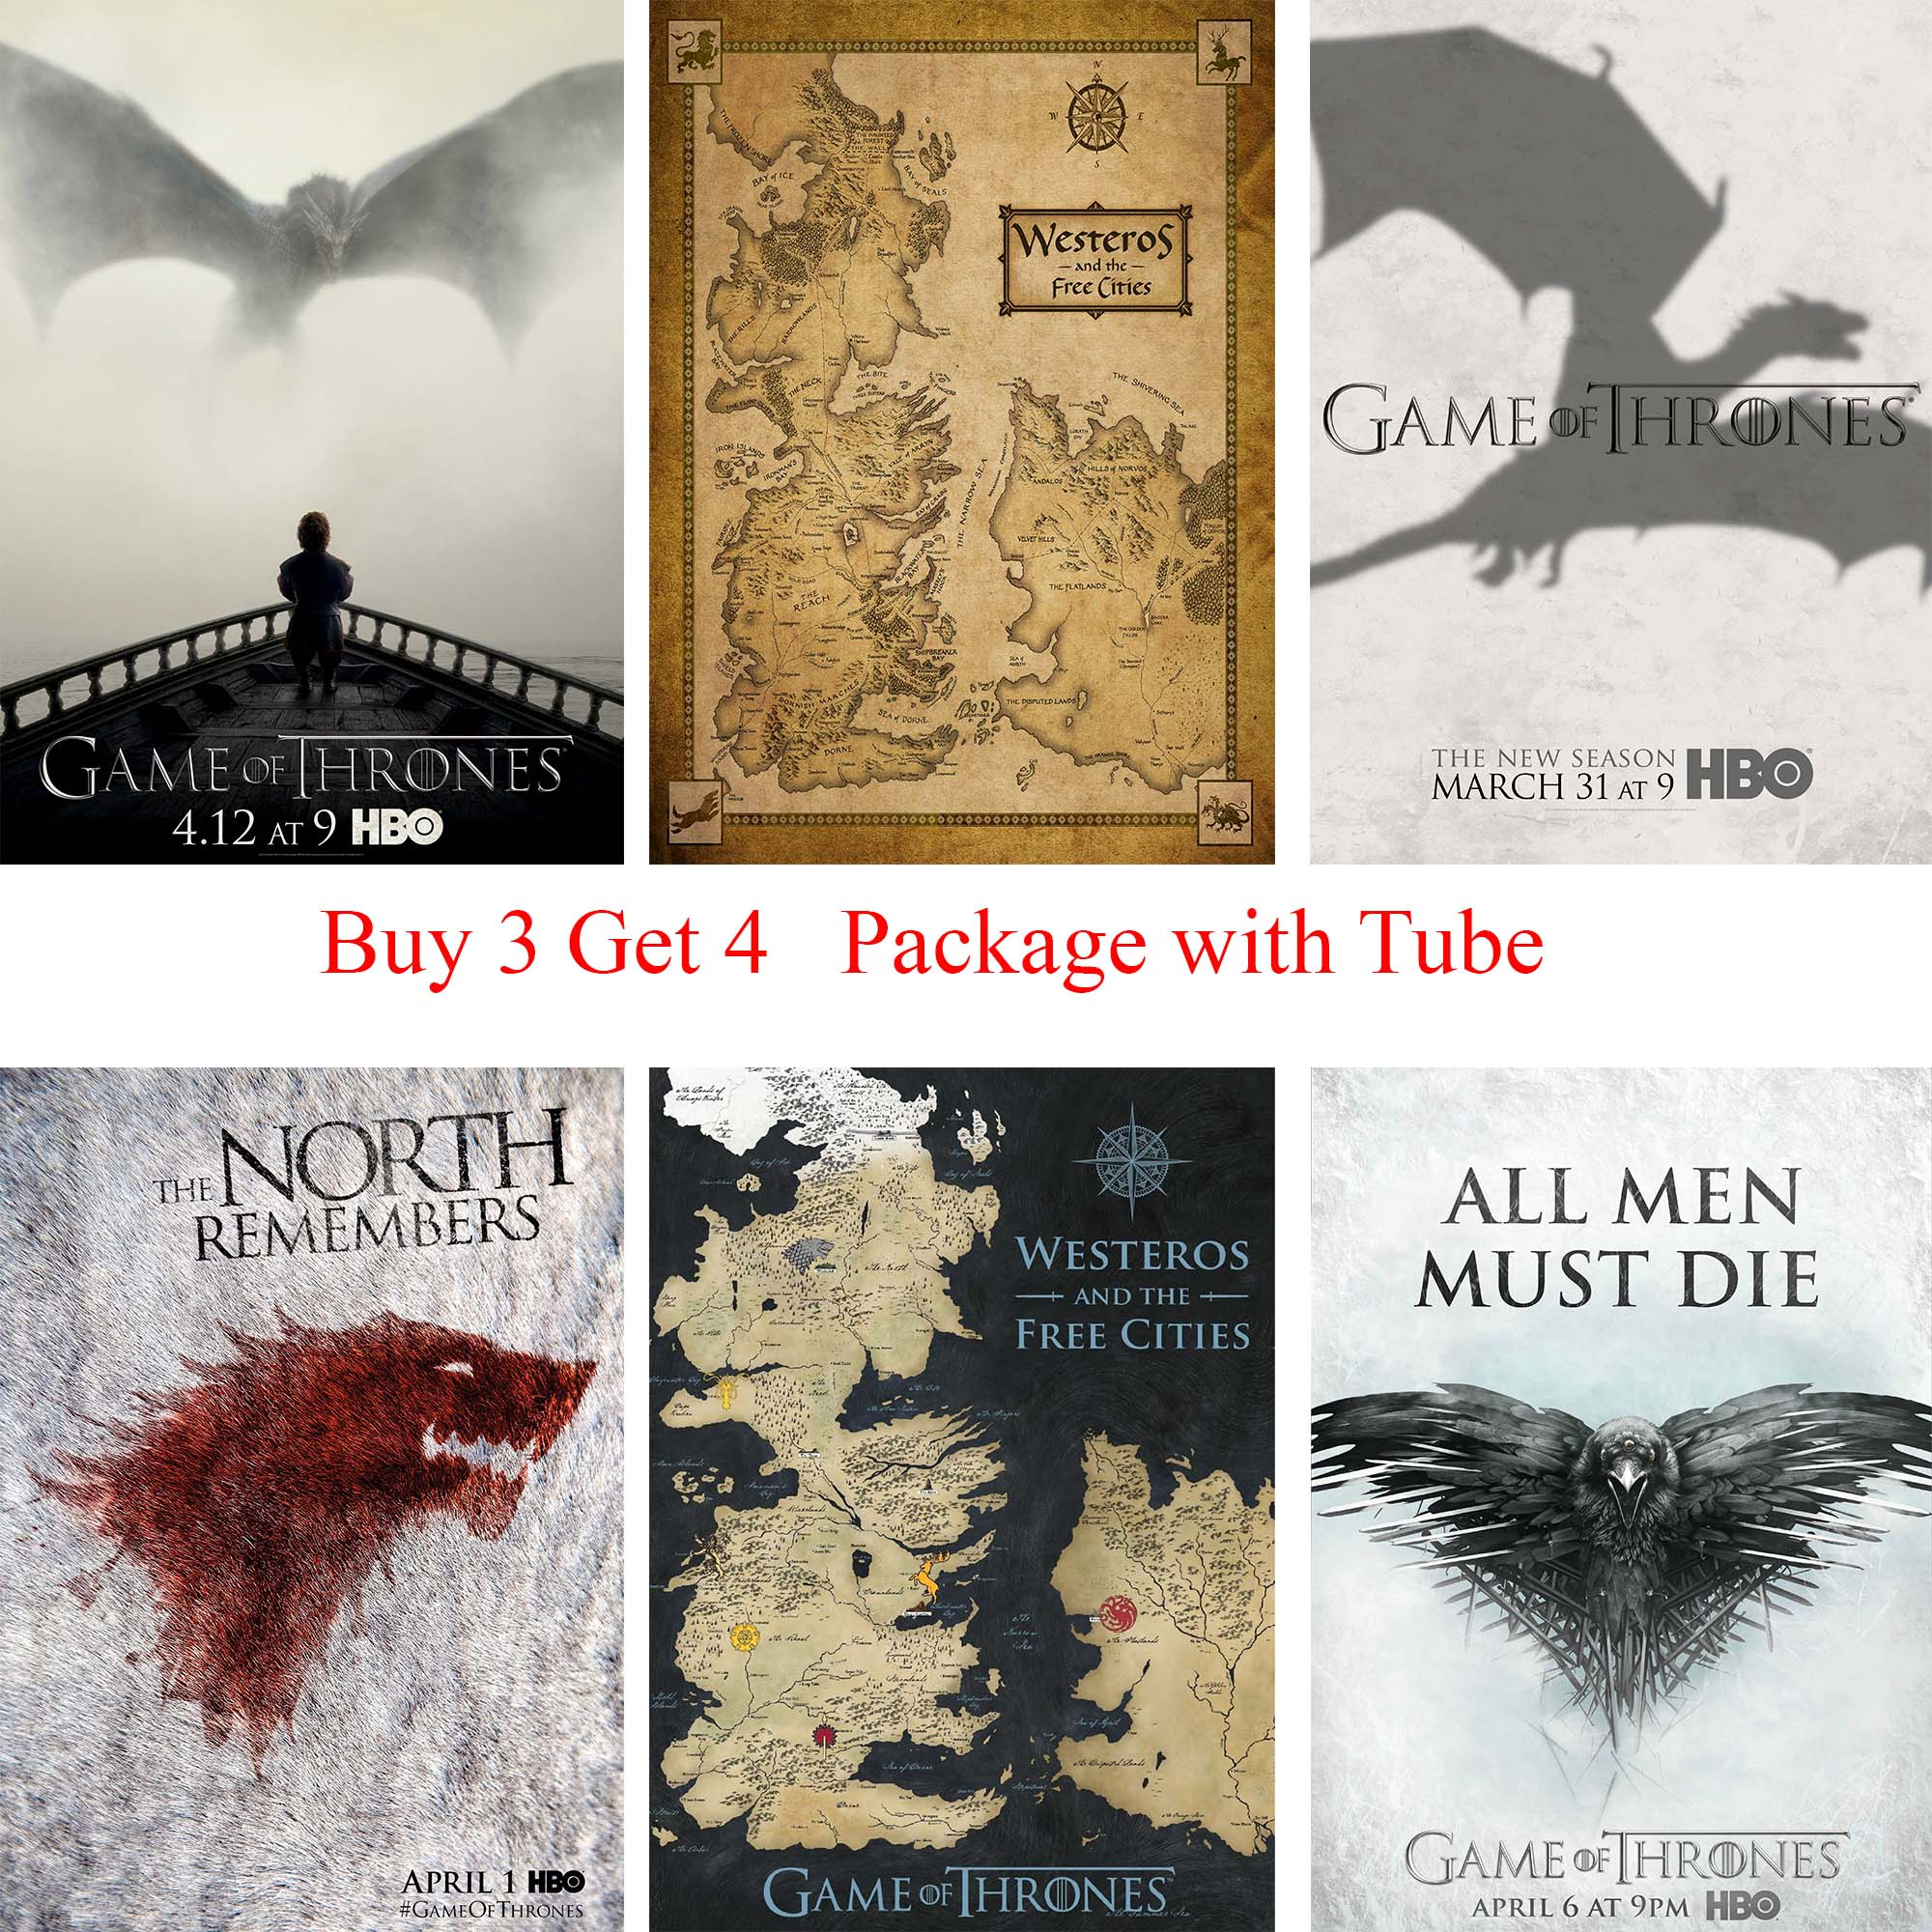 game of thrones poster westeros map print buy 1 get 2 free kunst autrement dit antiquitaten kunst